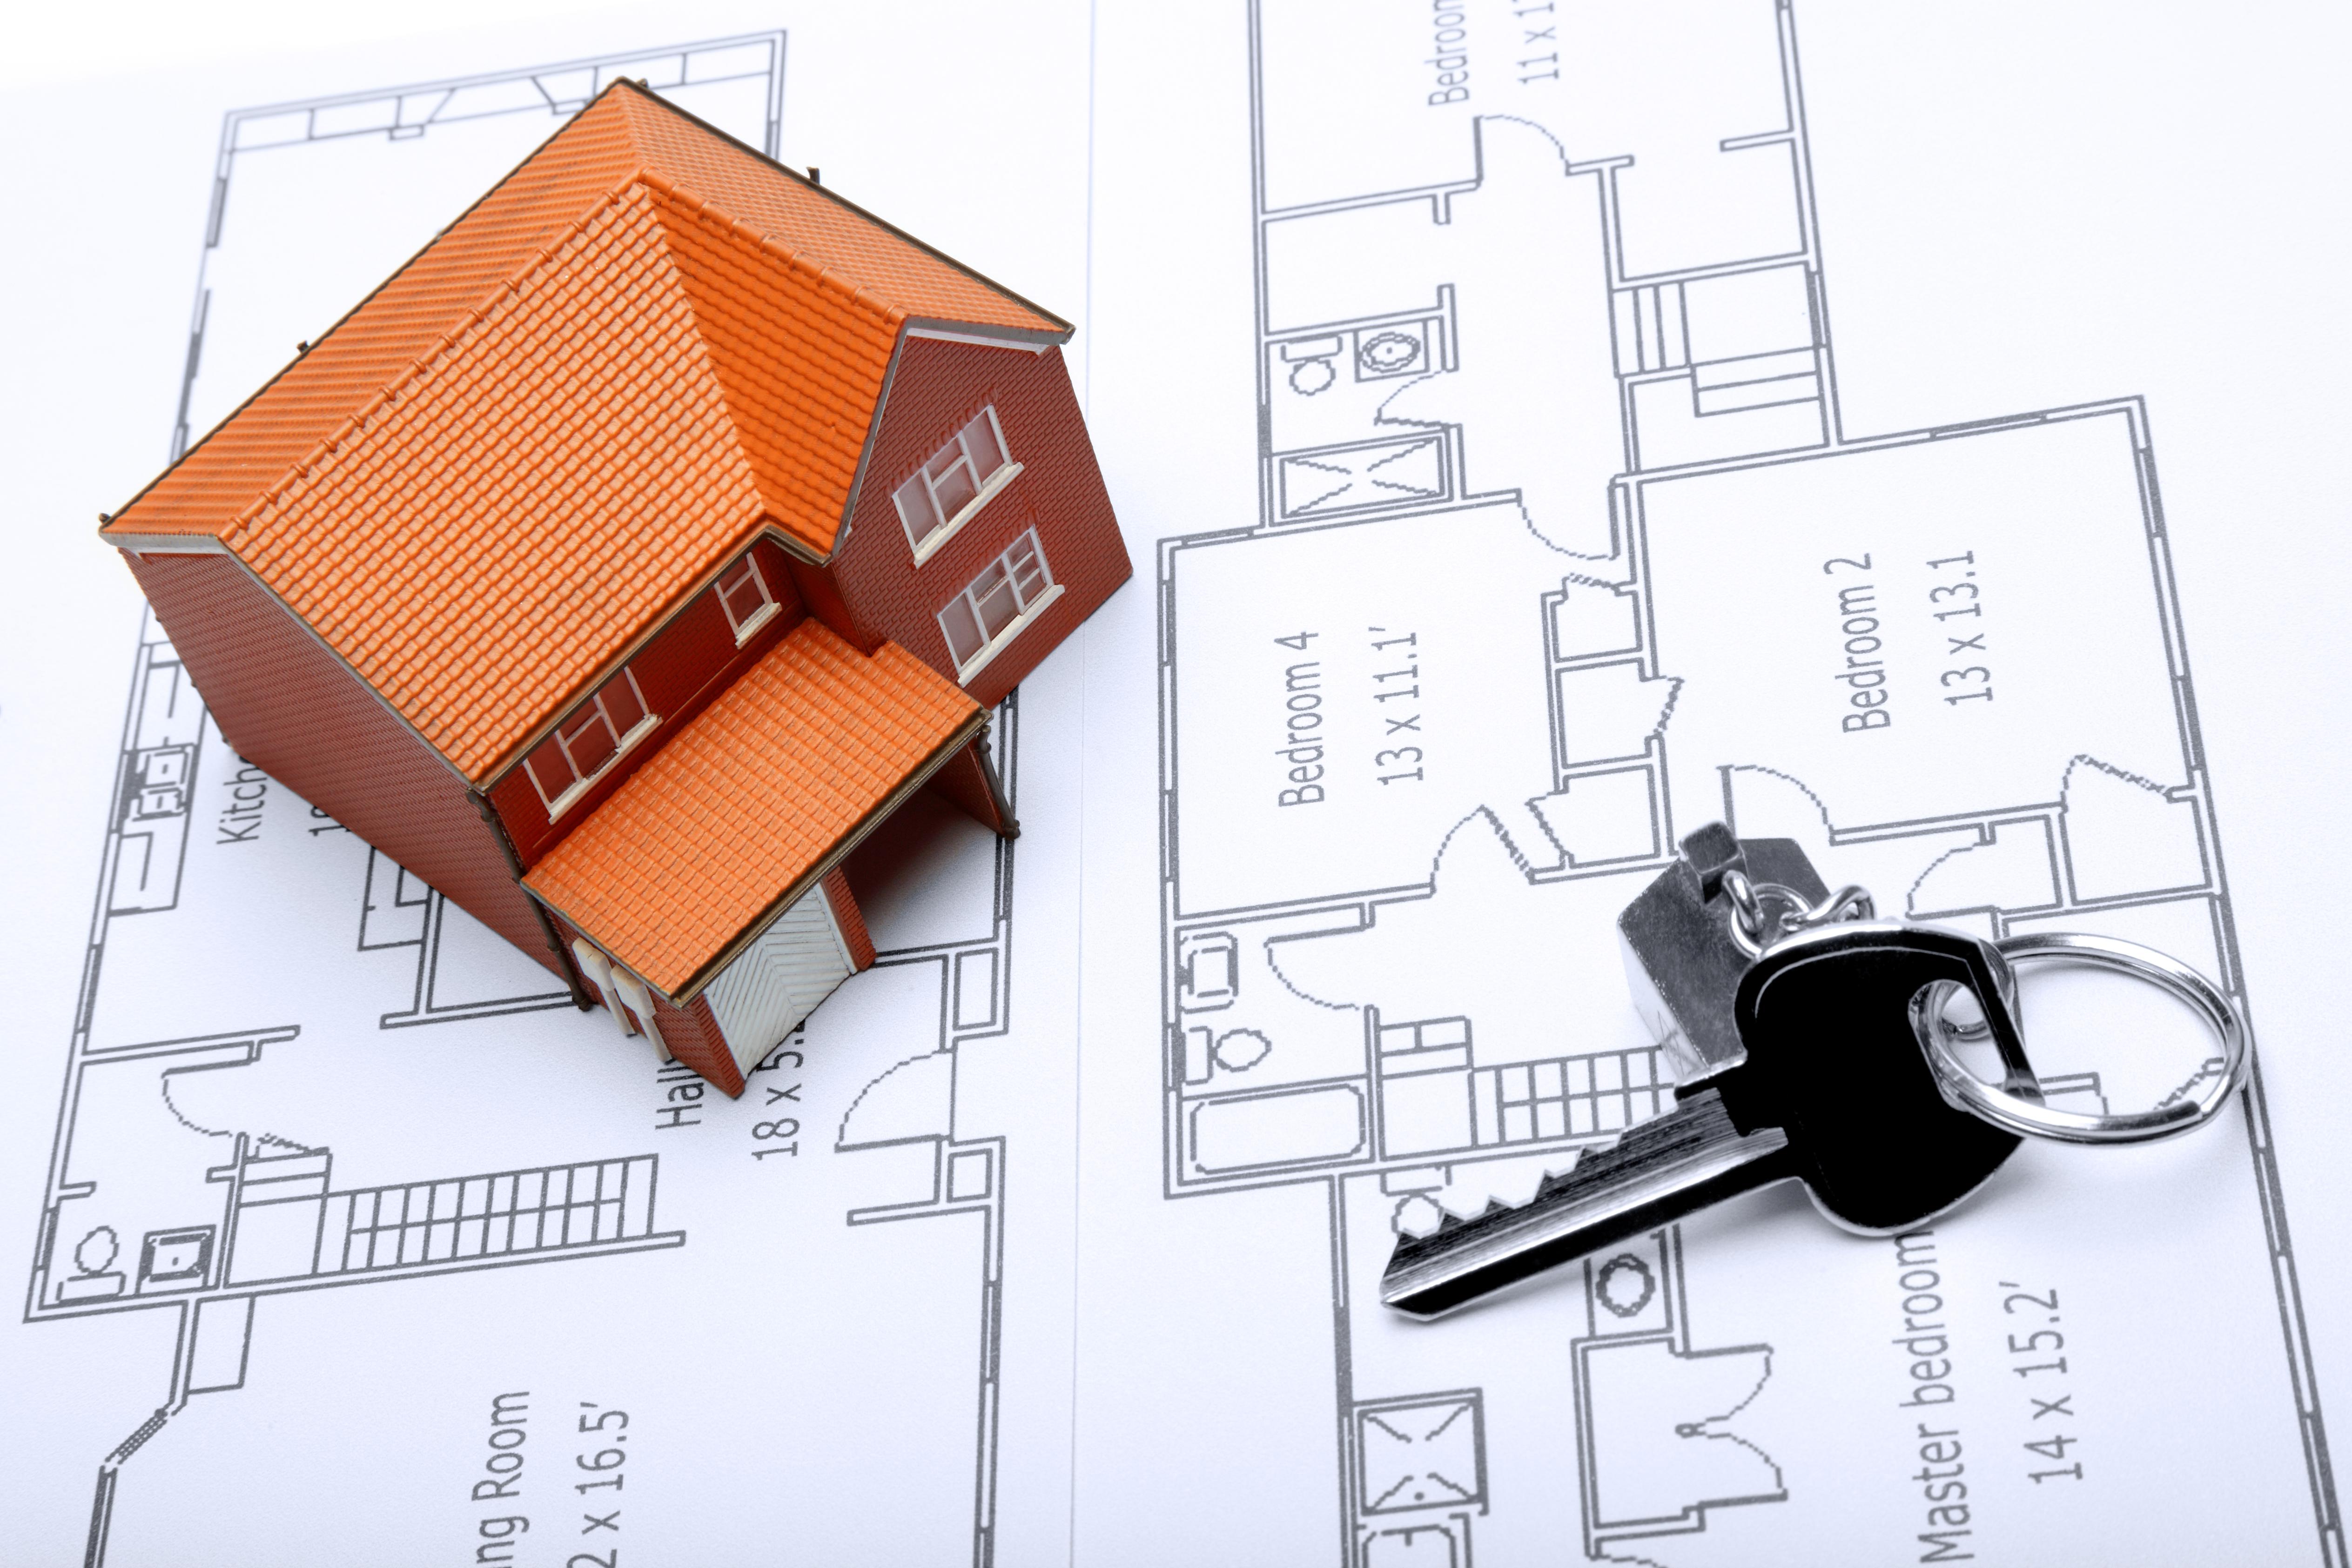 5054x3370 Estate Agent Floor Plans Architectural Floor Plan Property